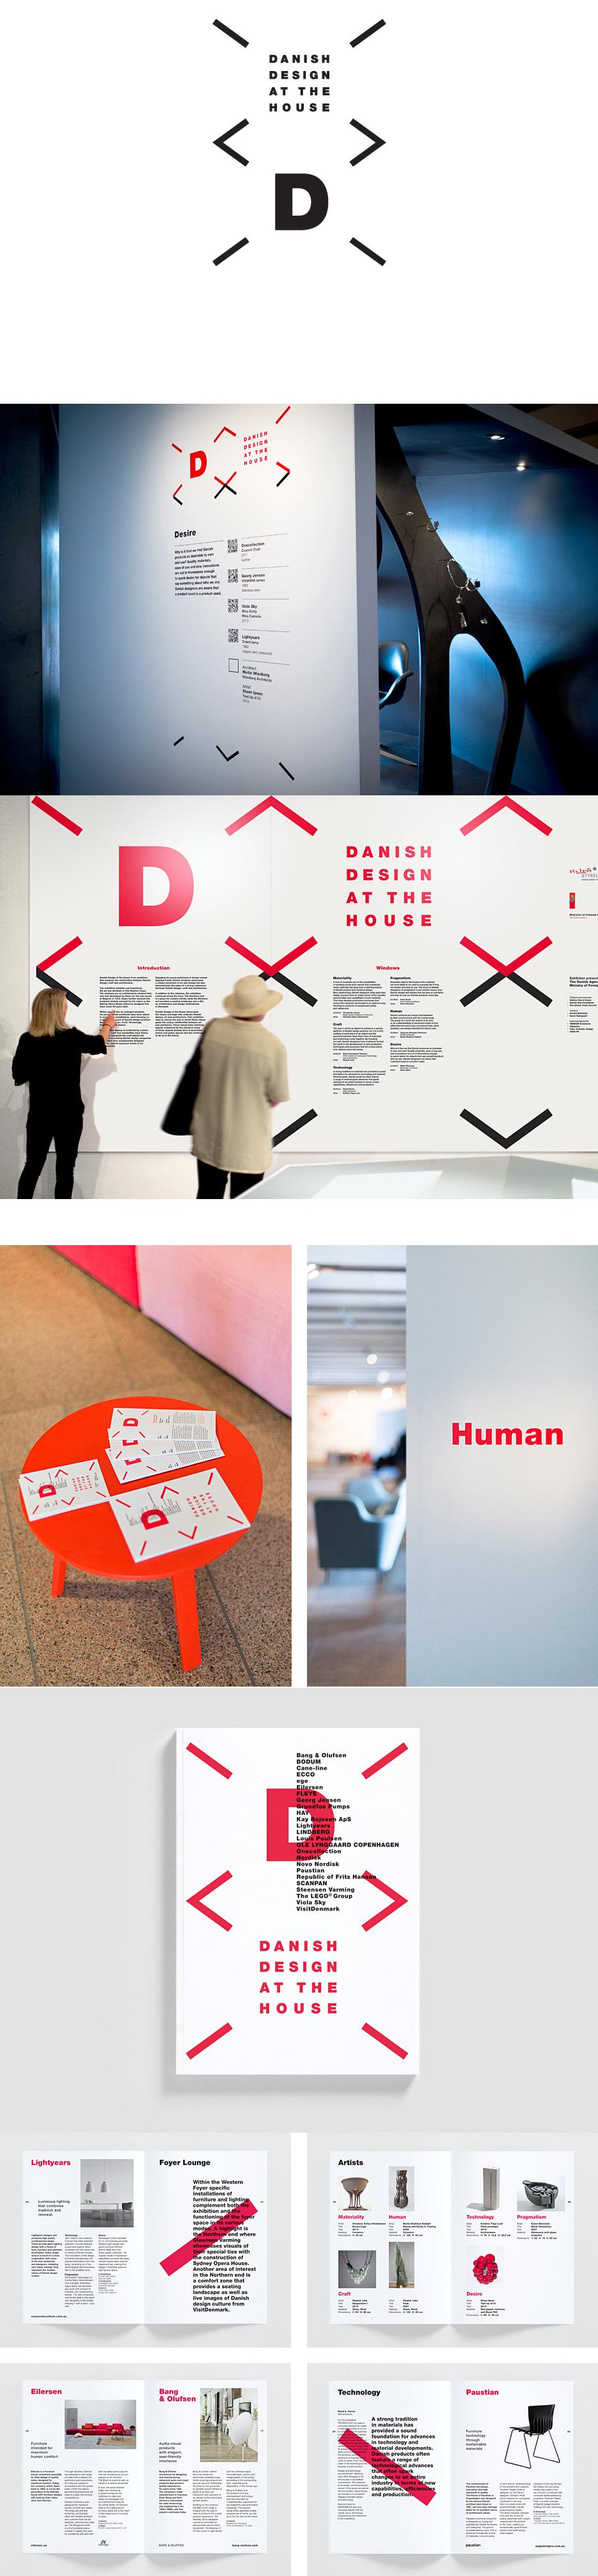 Danish Design At The House Exhibition   Branding